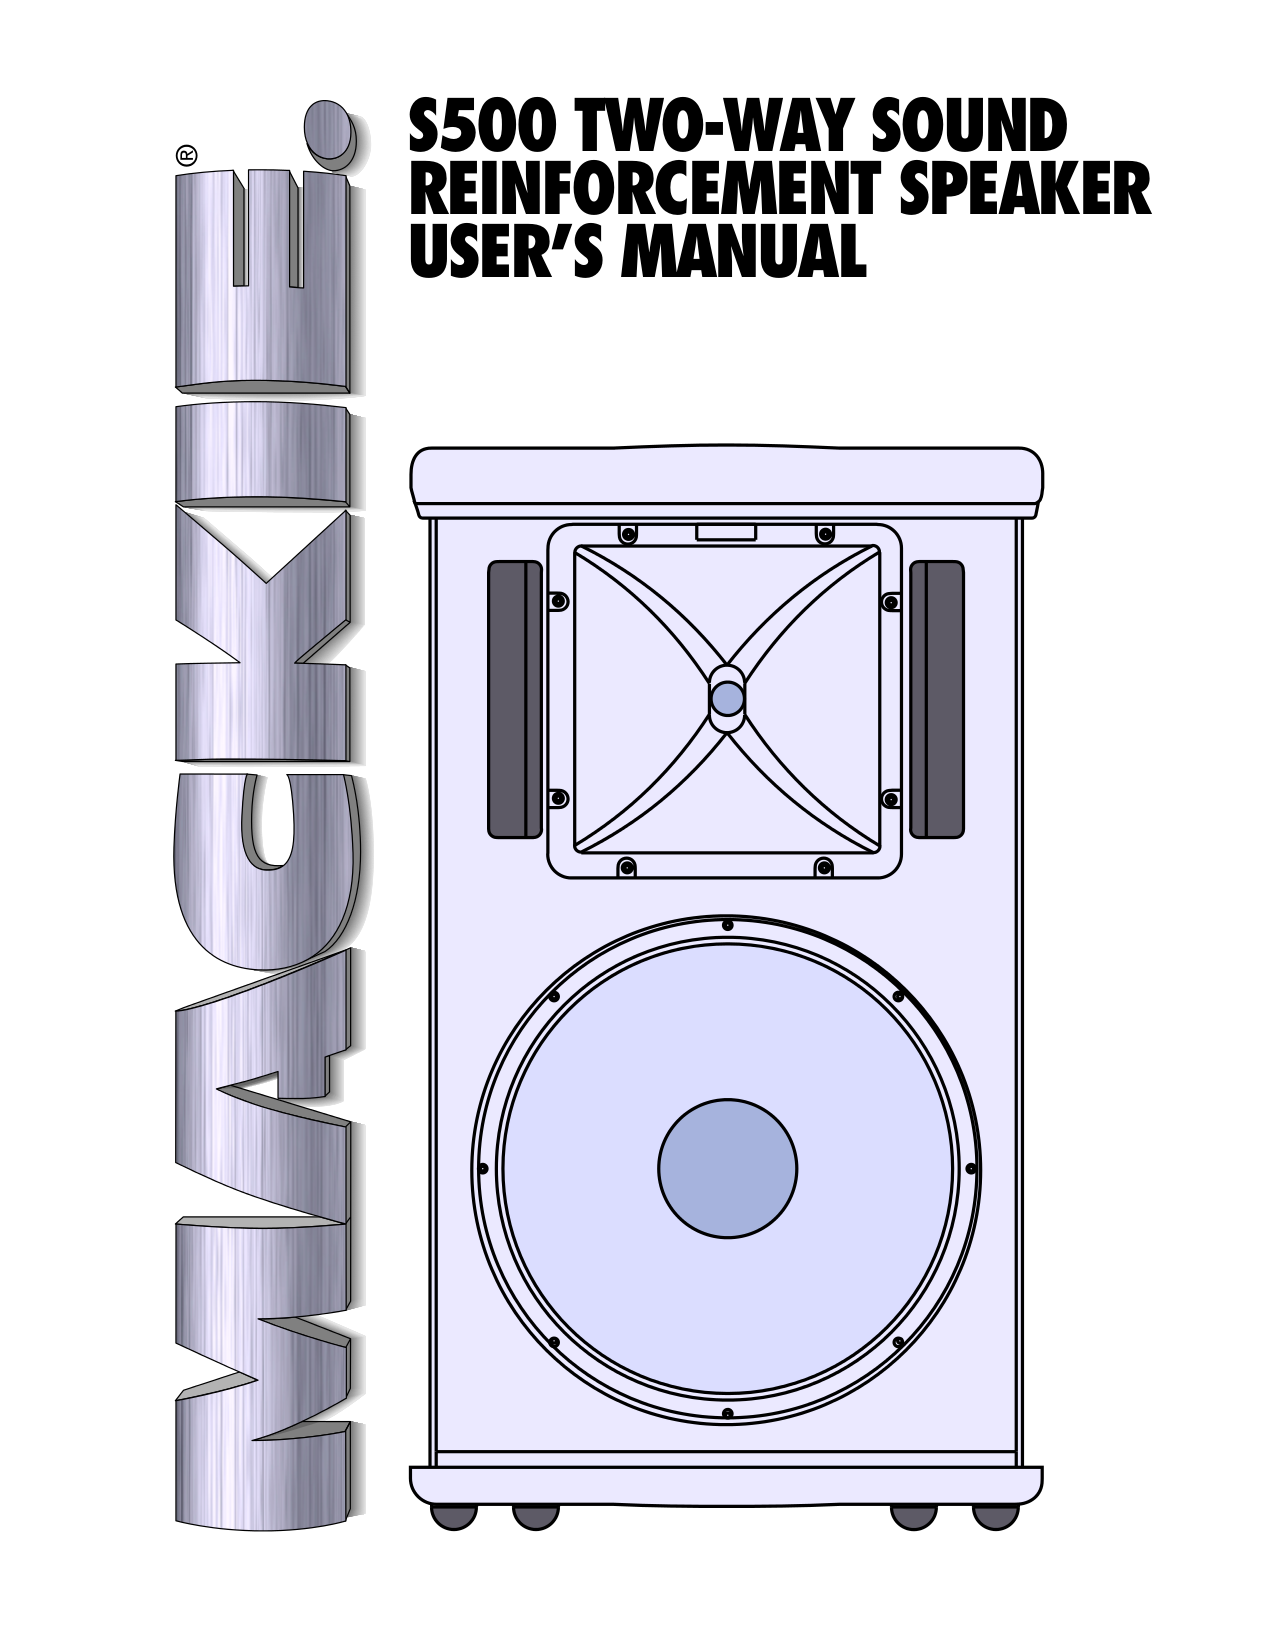 pdf for Mackie Speaker System S500 manual